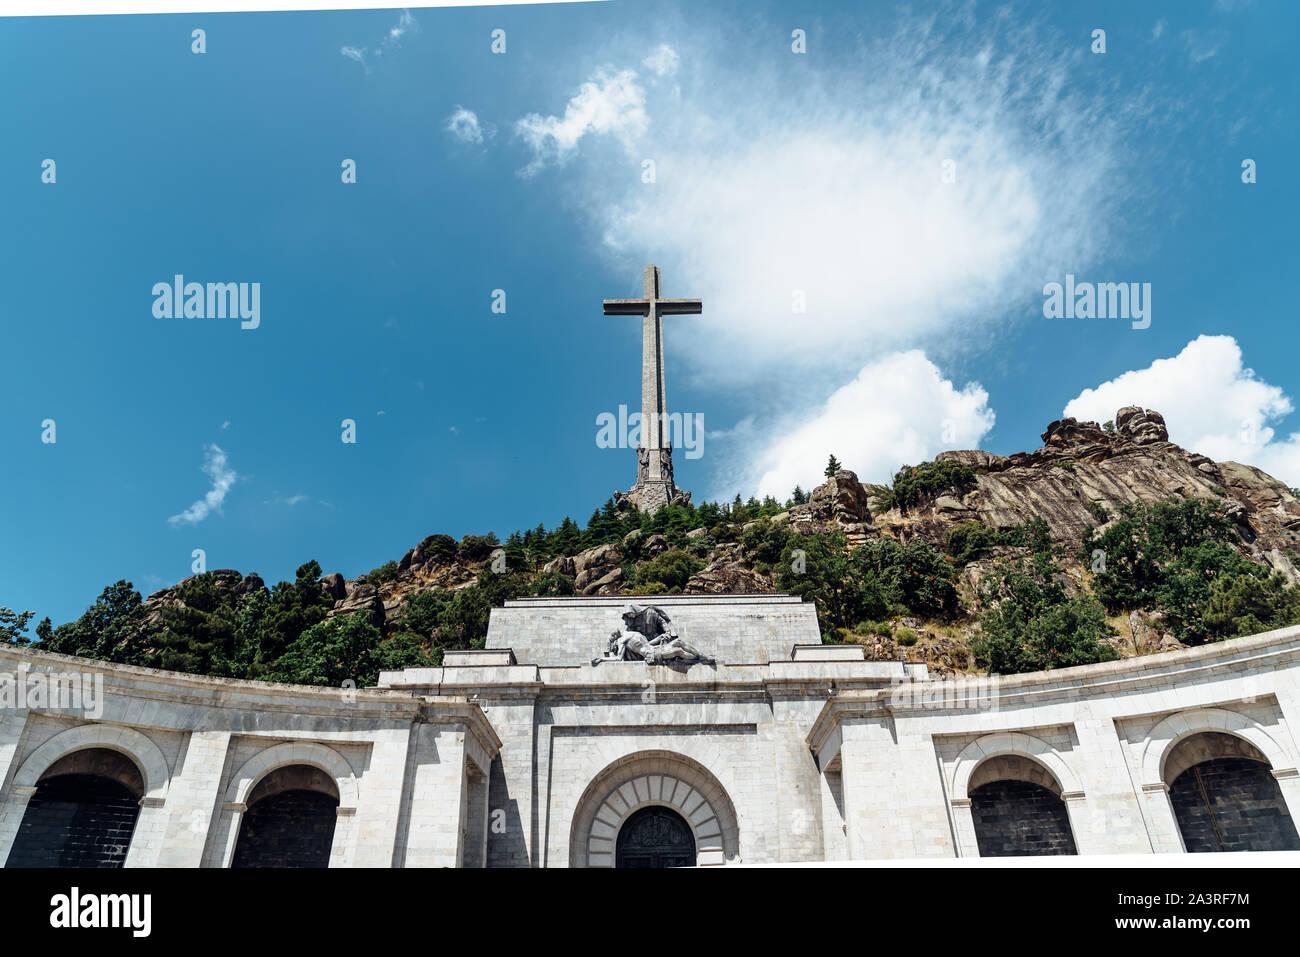 San Lorenzo de El Escorial, Spain - July 7, 2018: View of Valle de los Caidos or Valley of the Fallen. It was erected in the Mountain Range of Guadarr Stock Photo